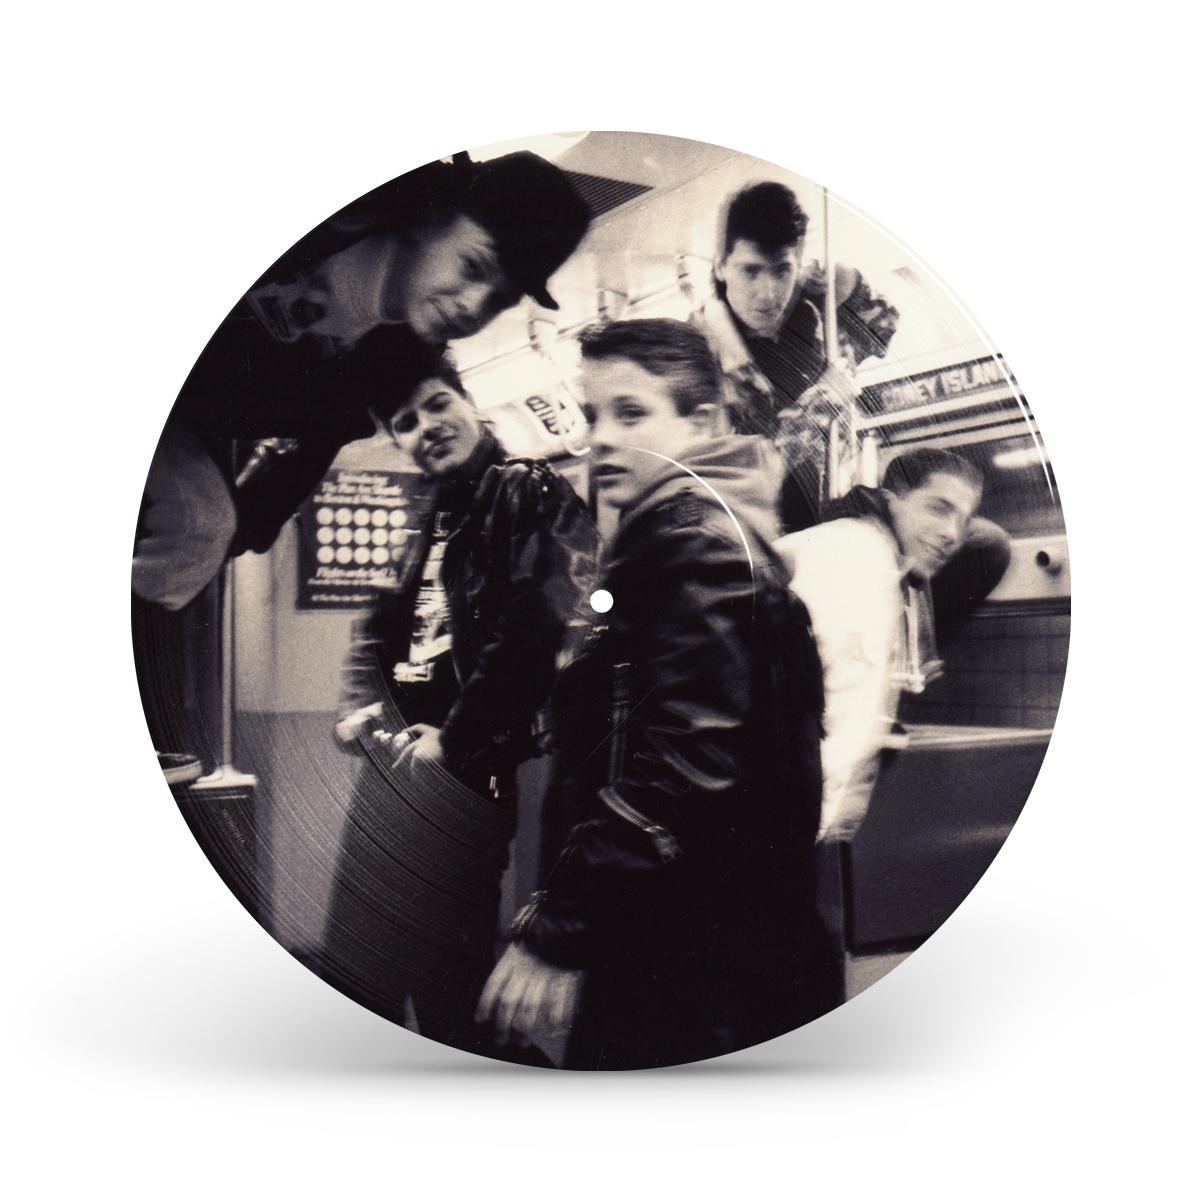 Hangin' Tough 30th Anniversary Picture Disc Vinyl LP